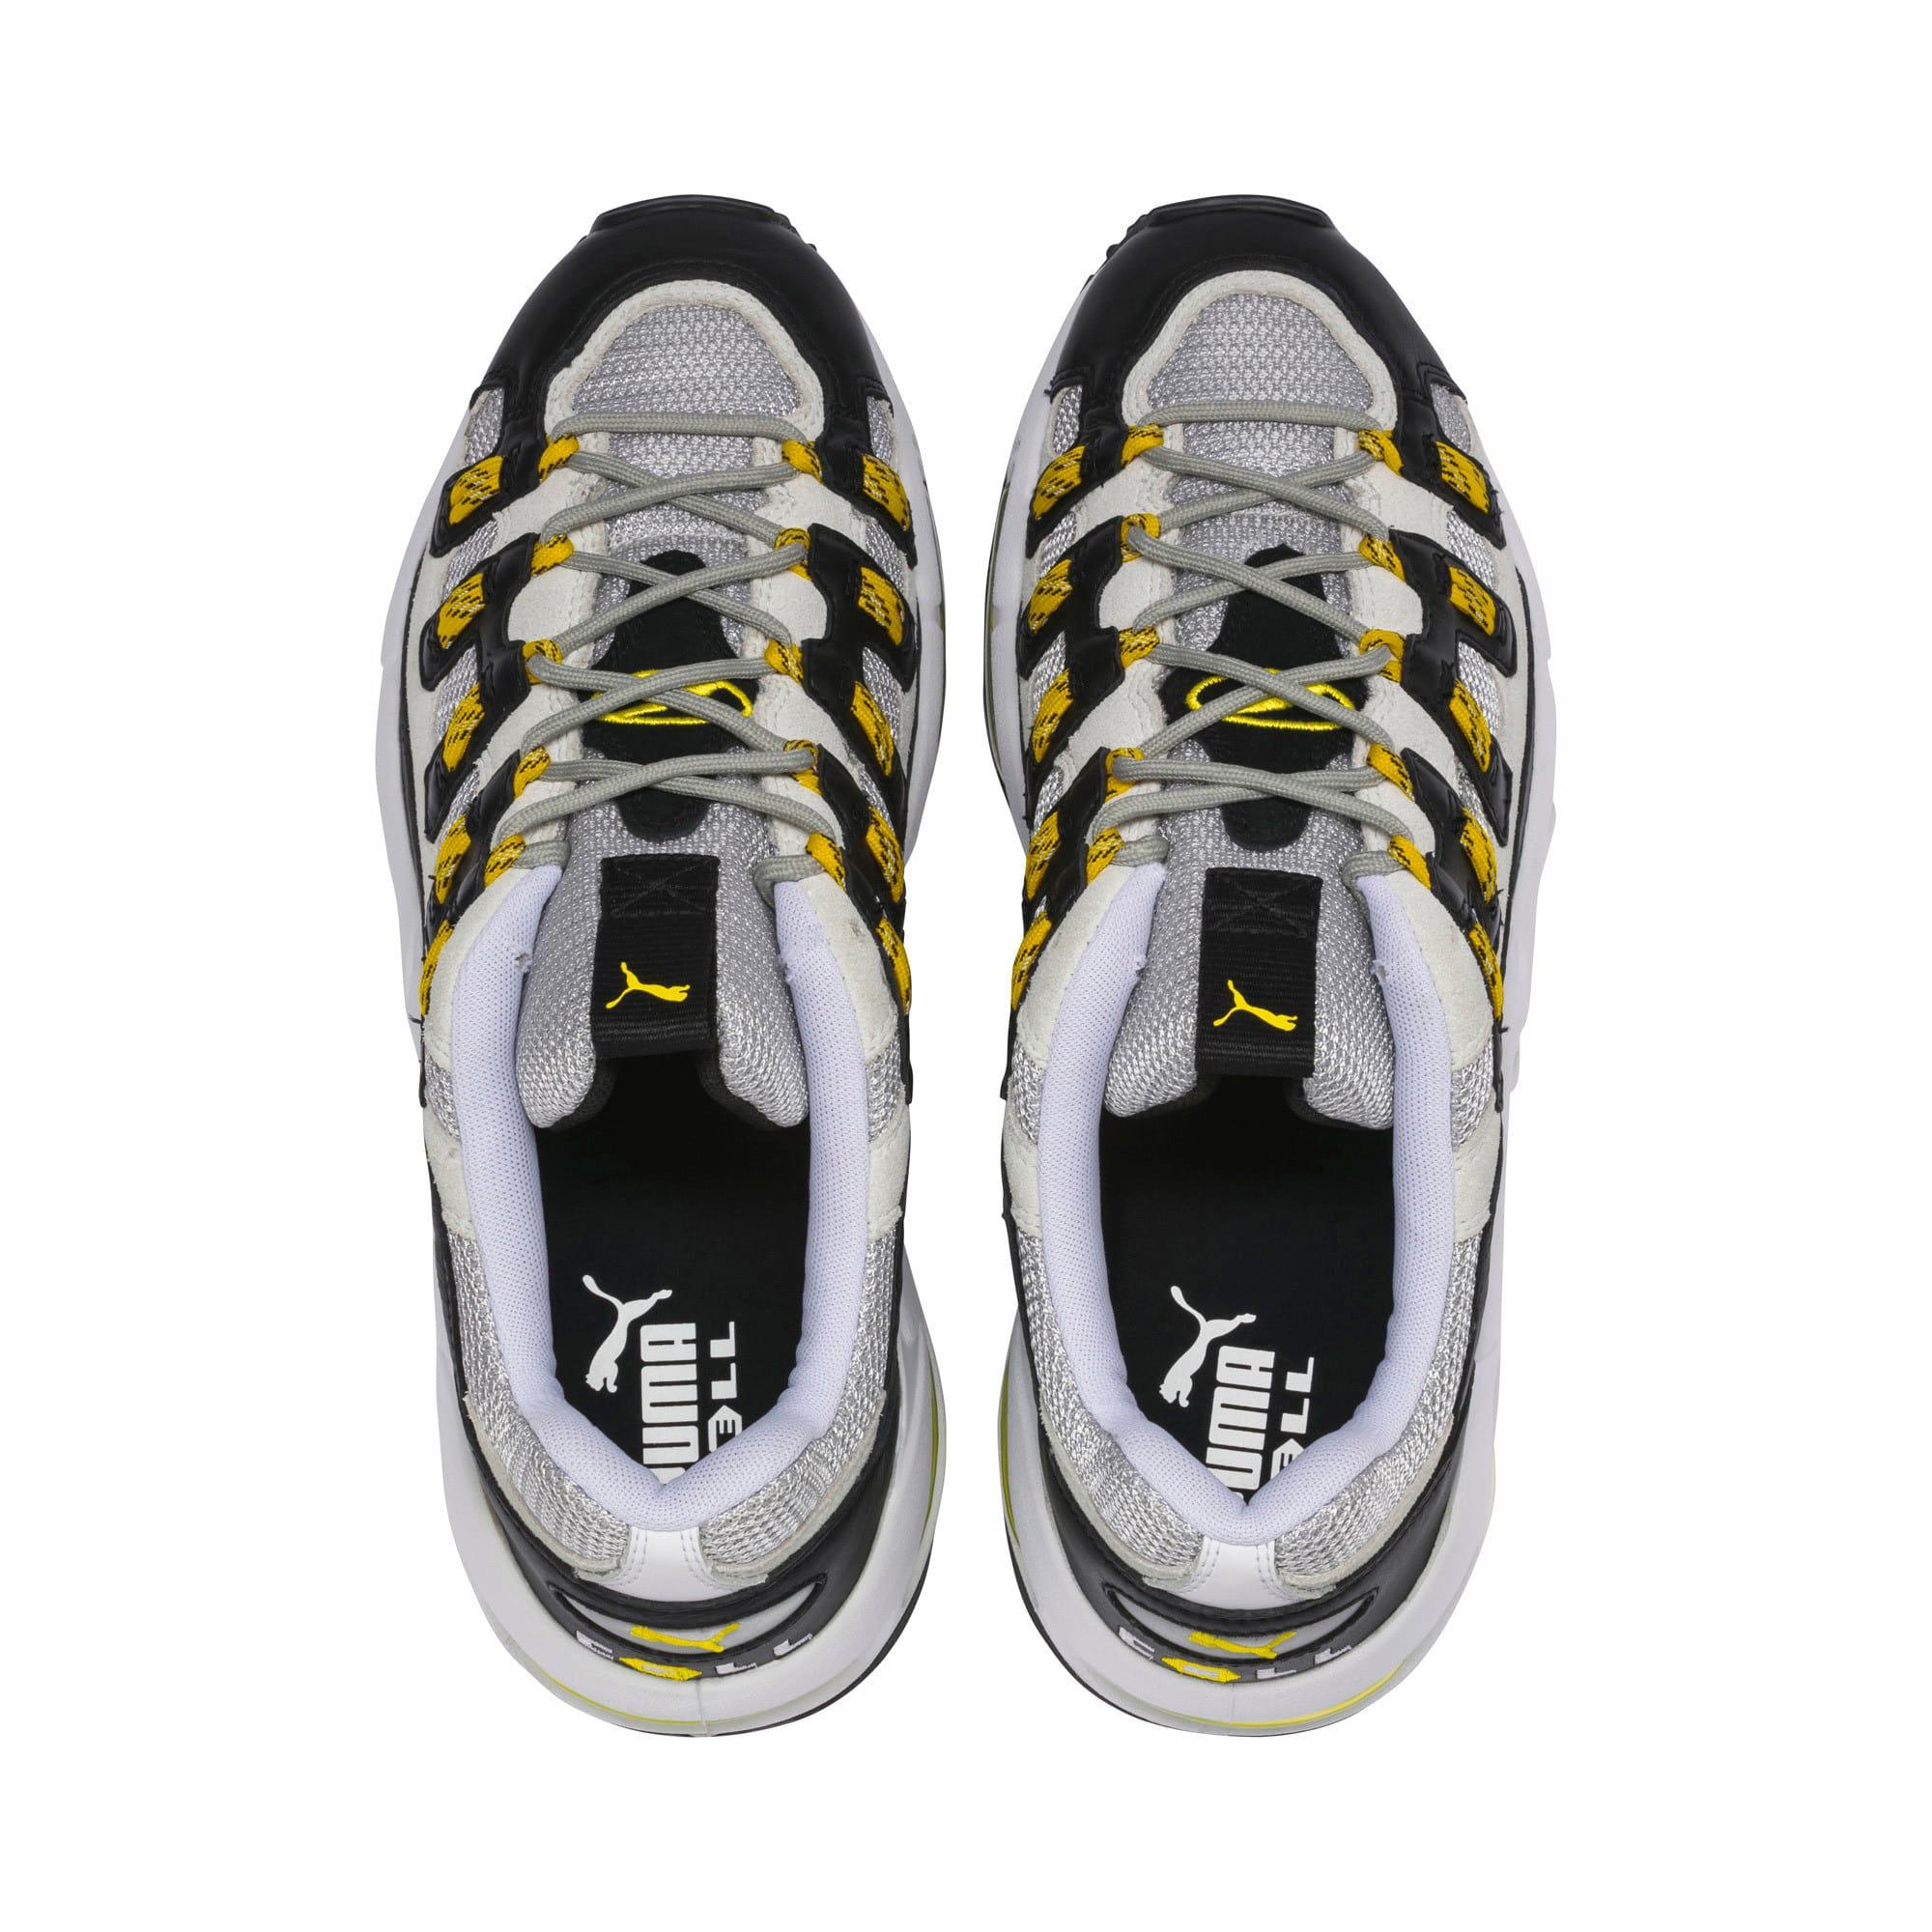 Thumbnail 6 of Cell Endura Trainers, Puma White-Blazing Yellow, medium-IND